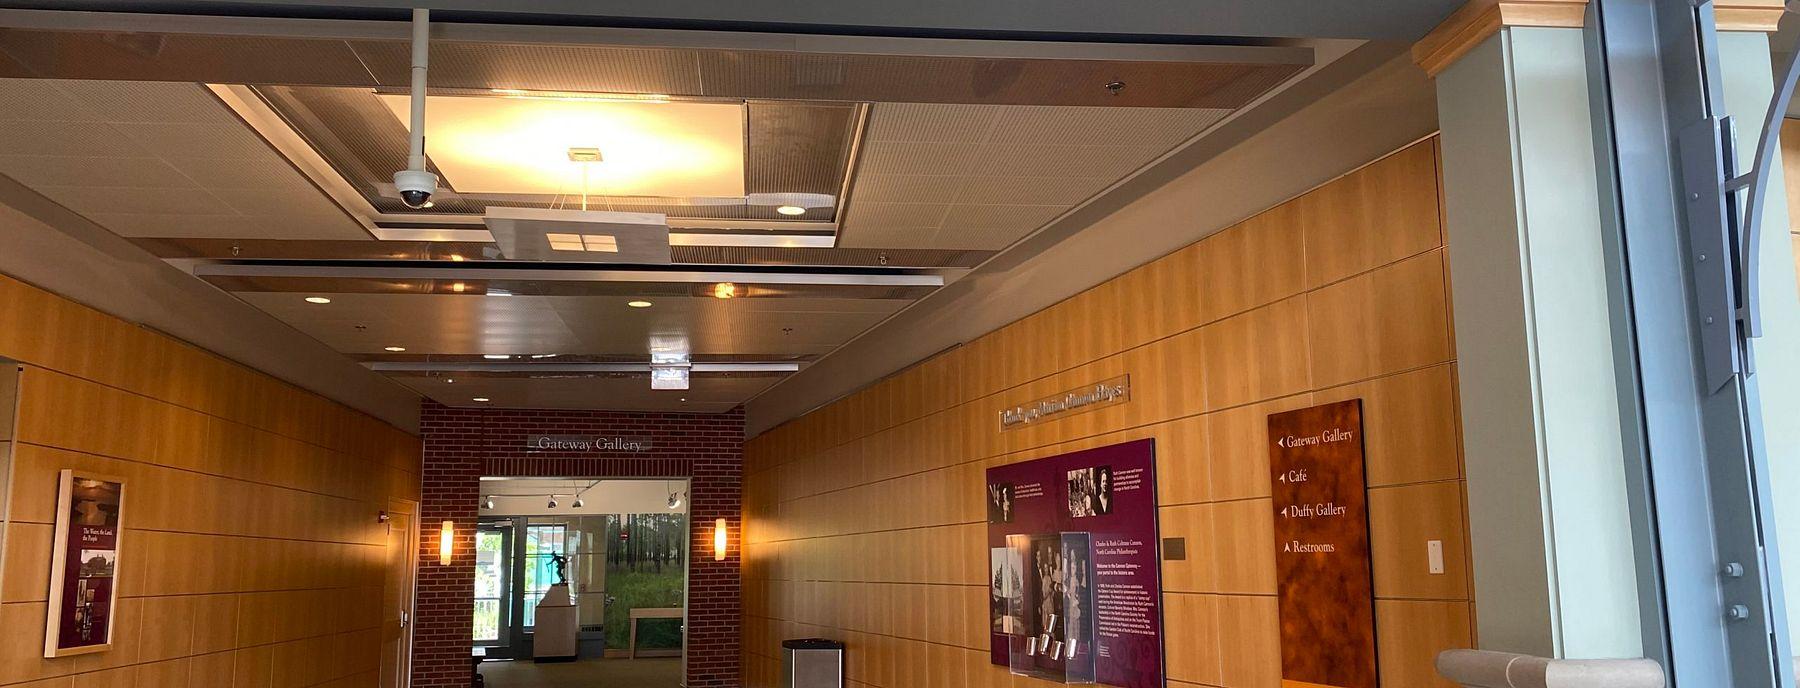 Cannon Gateway located in the North Carolina History Center